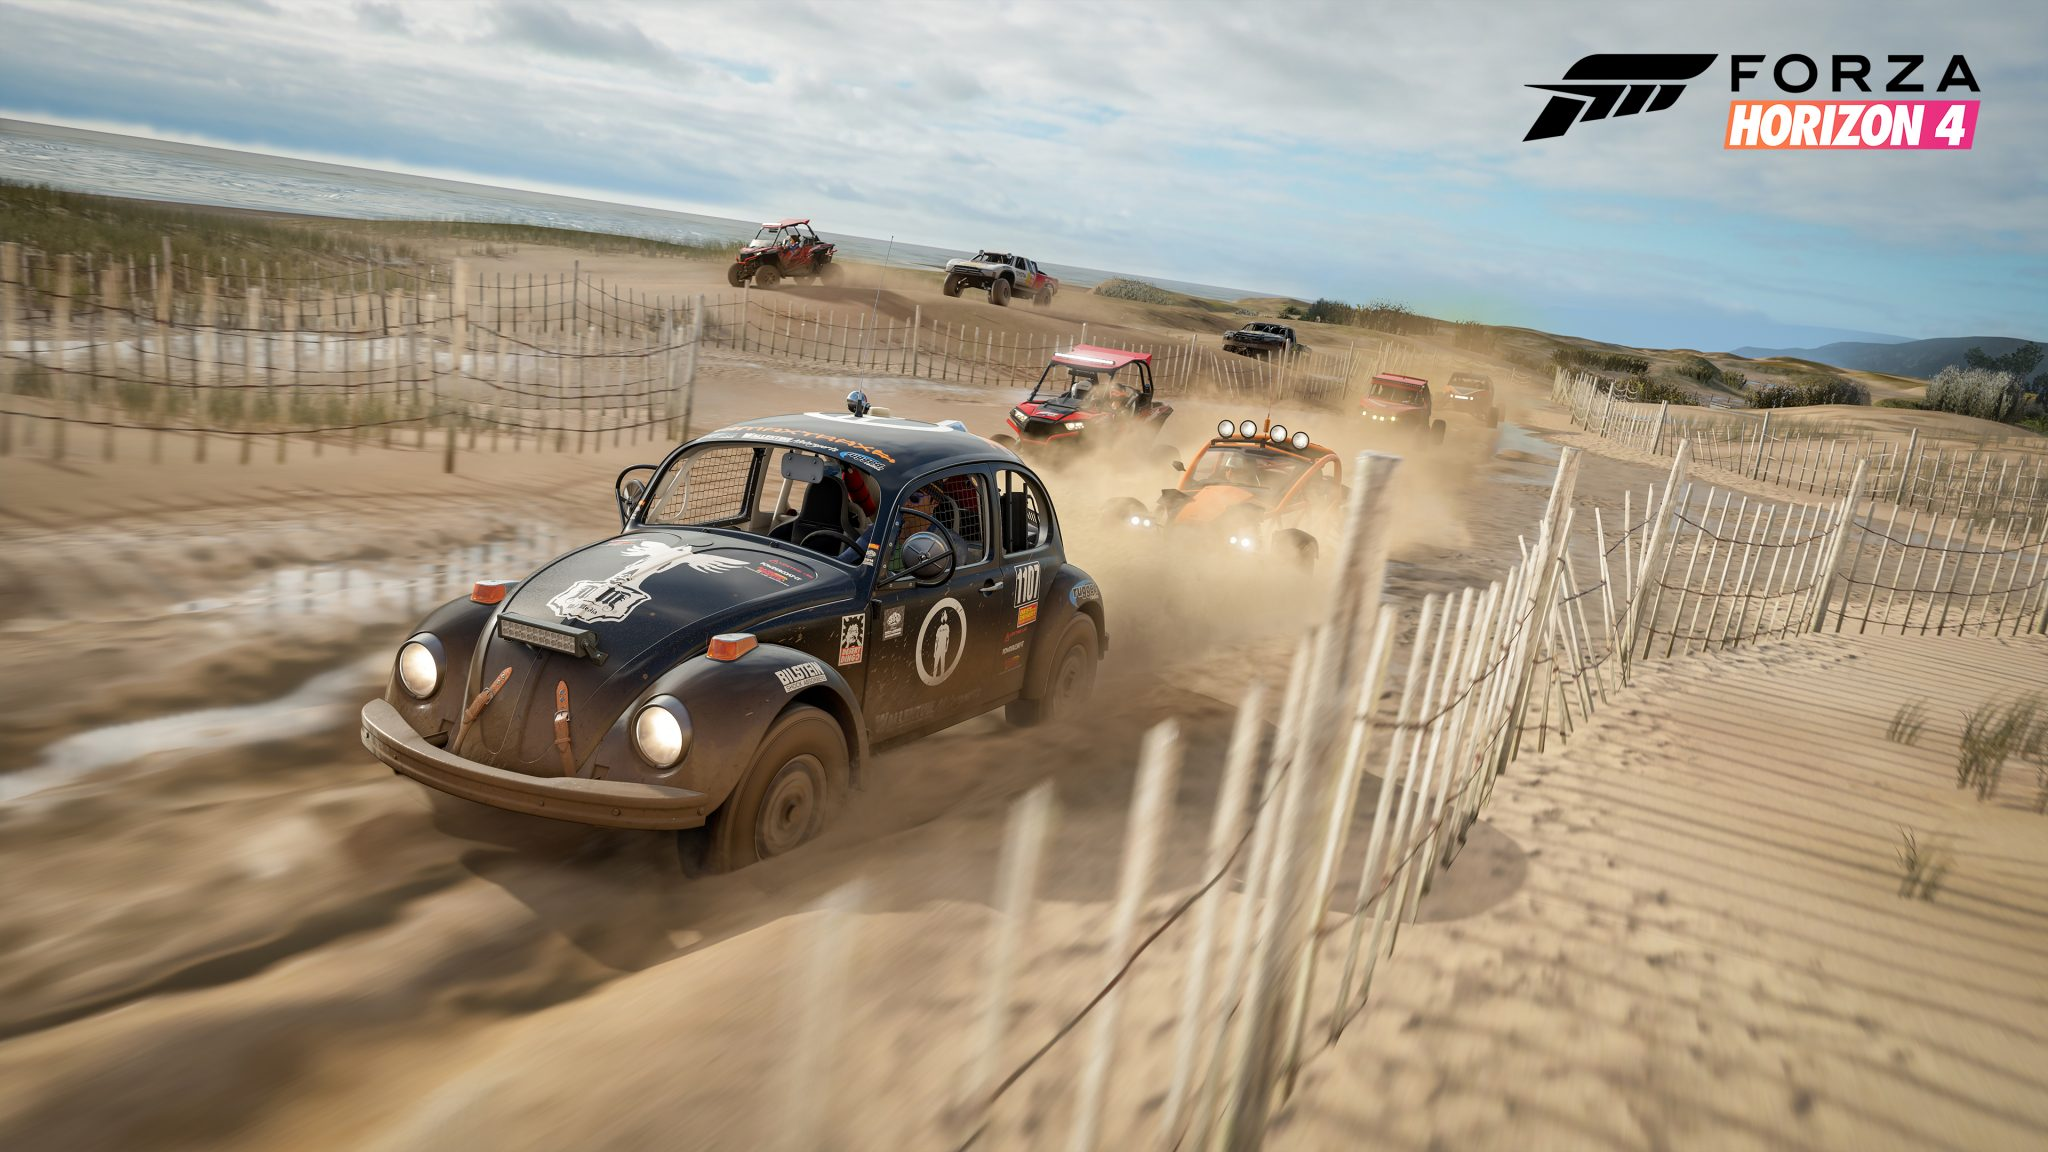 Forza Horizon 4 FH4 Xbox One X PC Ultimate Review Test Kritik Strand